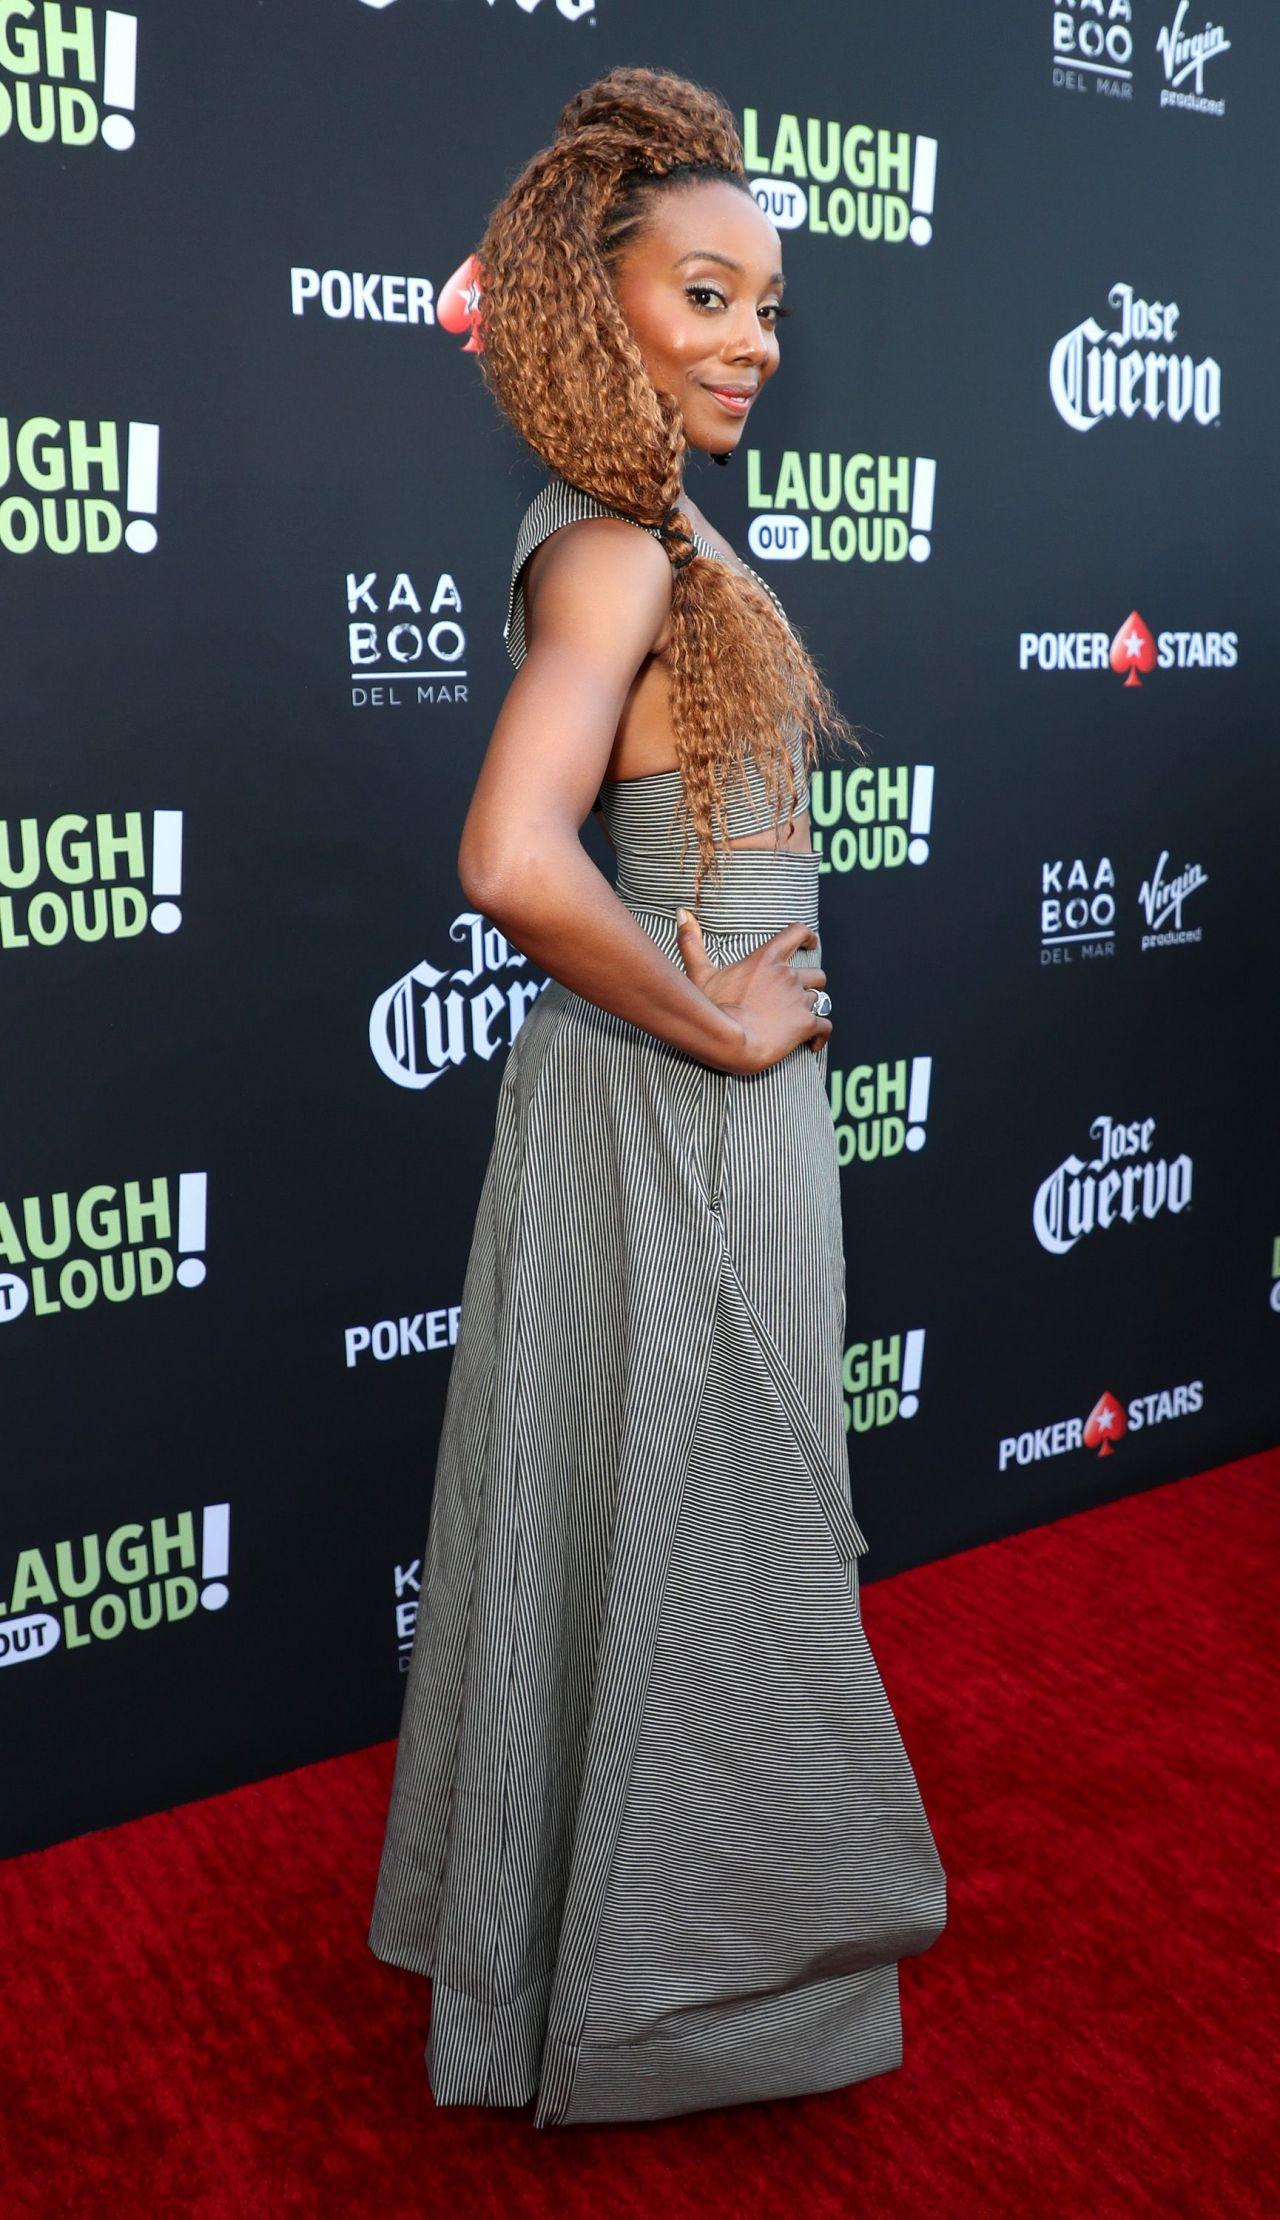 Laugh Out Loud Gala 2017